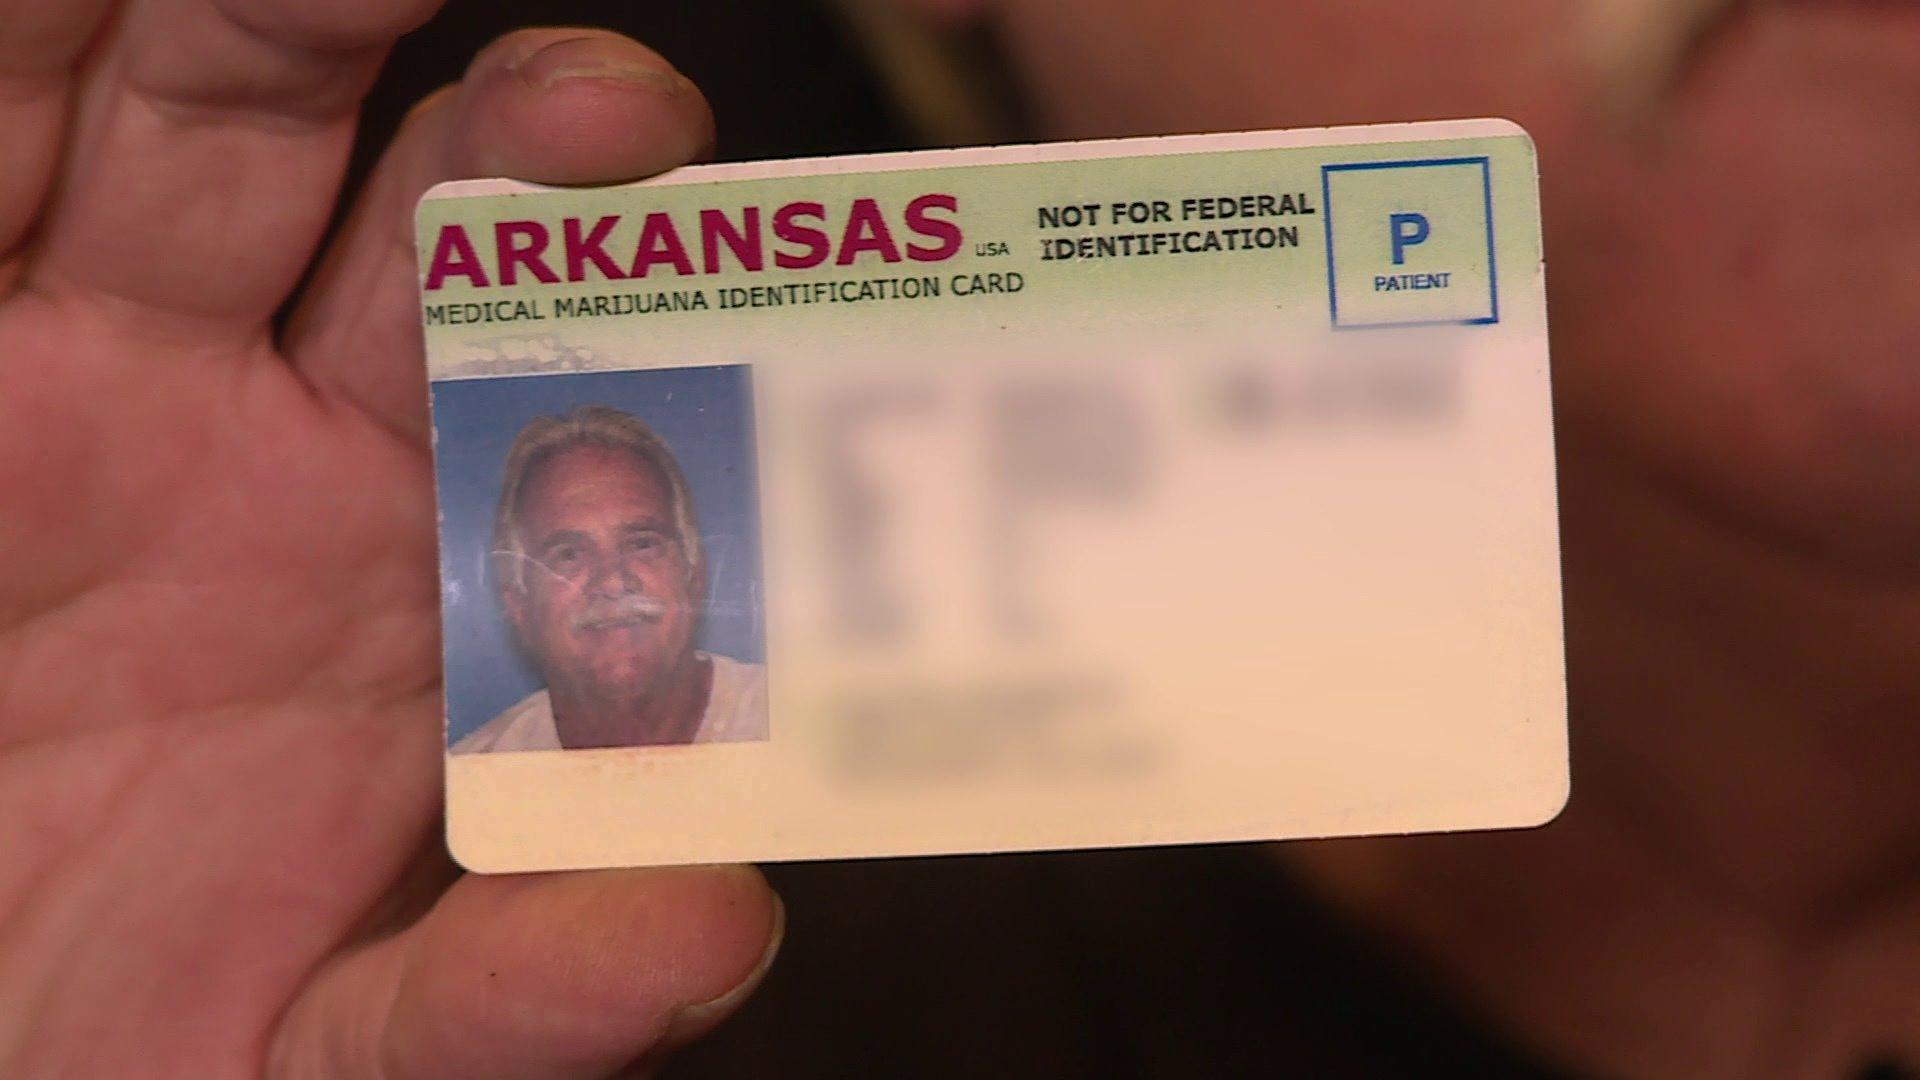 Arkansas Health Department To Reissue Medical Marijuana Cards